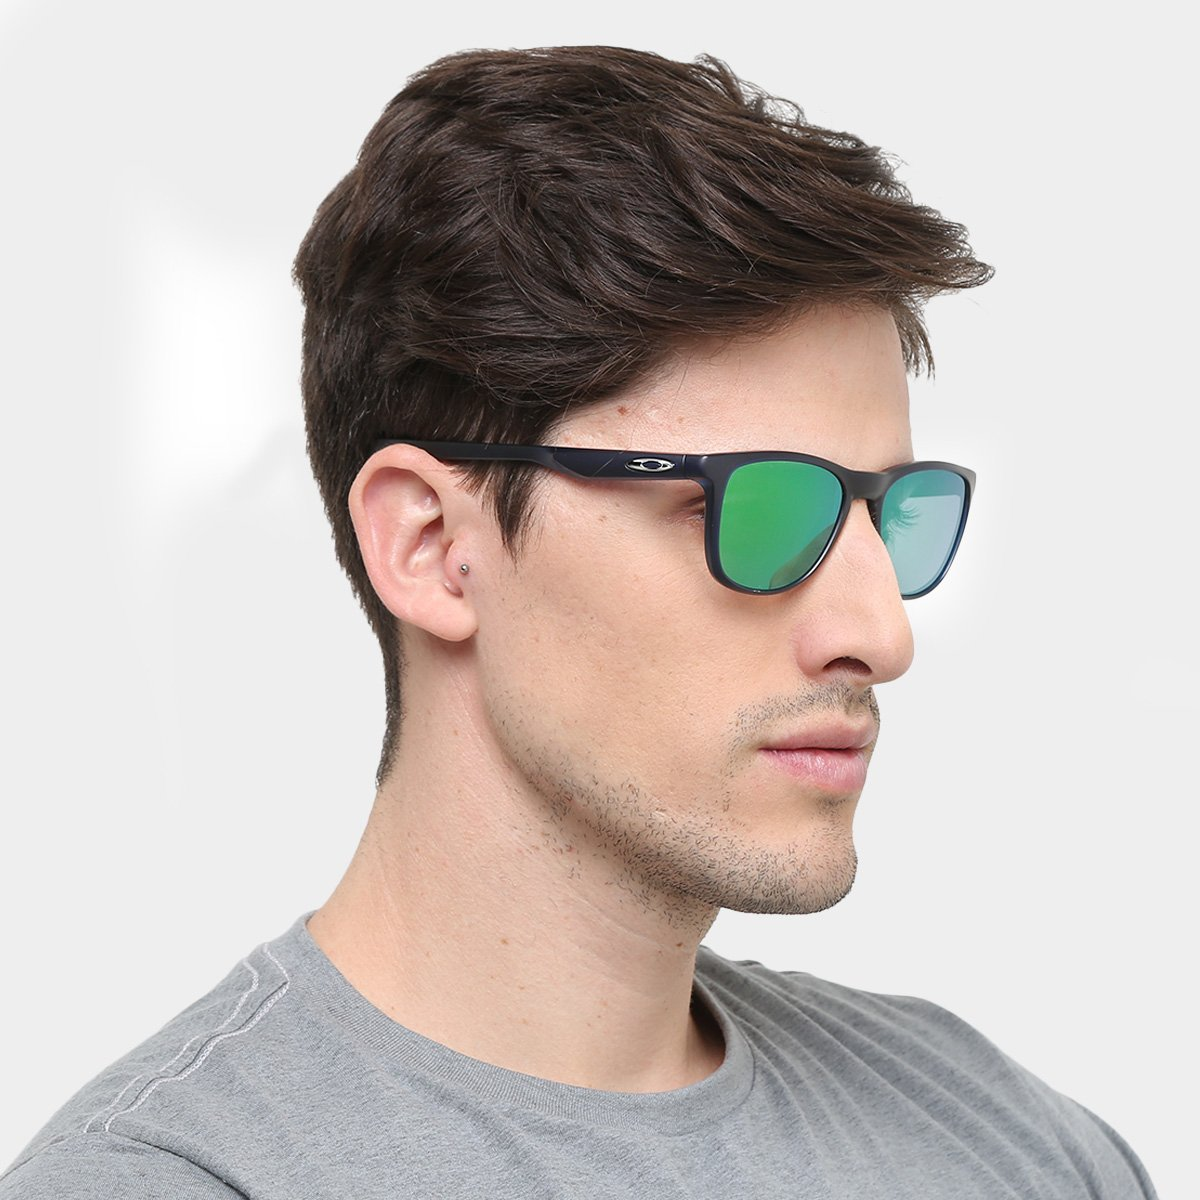 459d5eb3dd7917 Óculos de Sol Oakley Trillbe X Masculino - Azul - Compre Agora ...